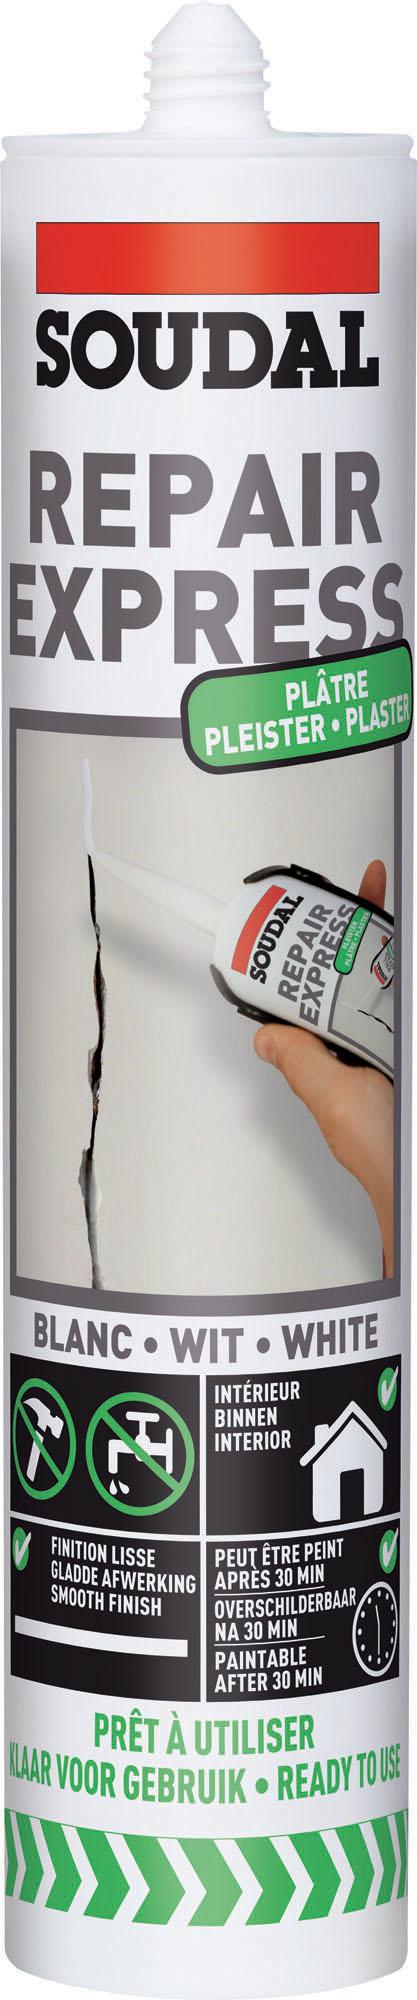 290ml Repair express kokers / cartouches